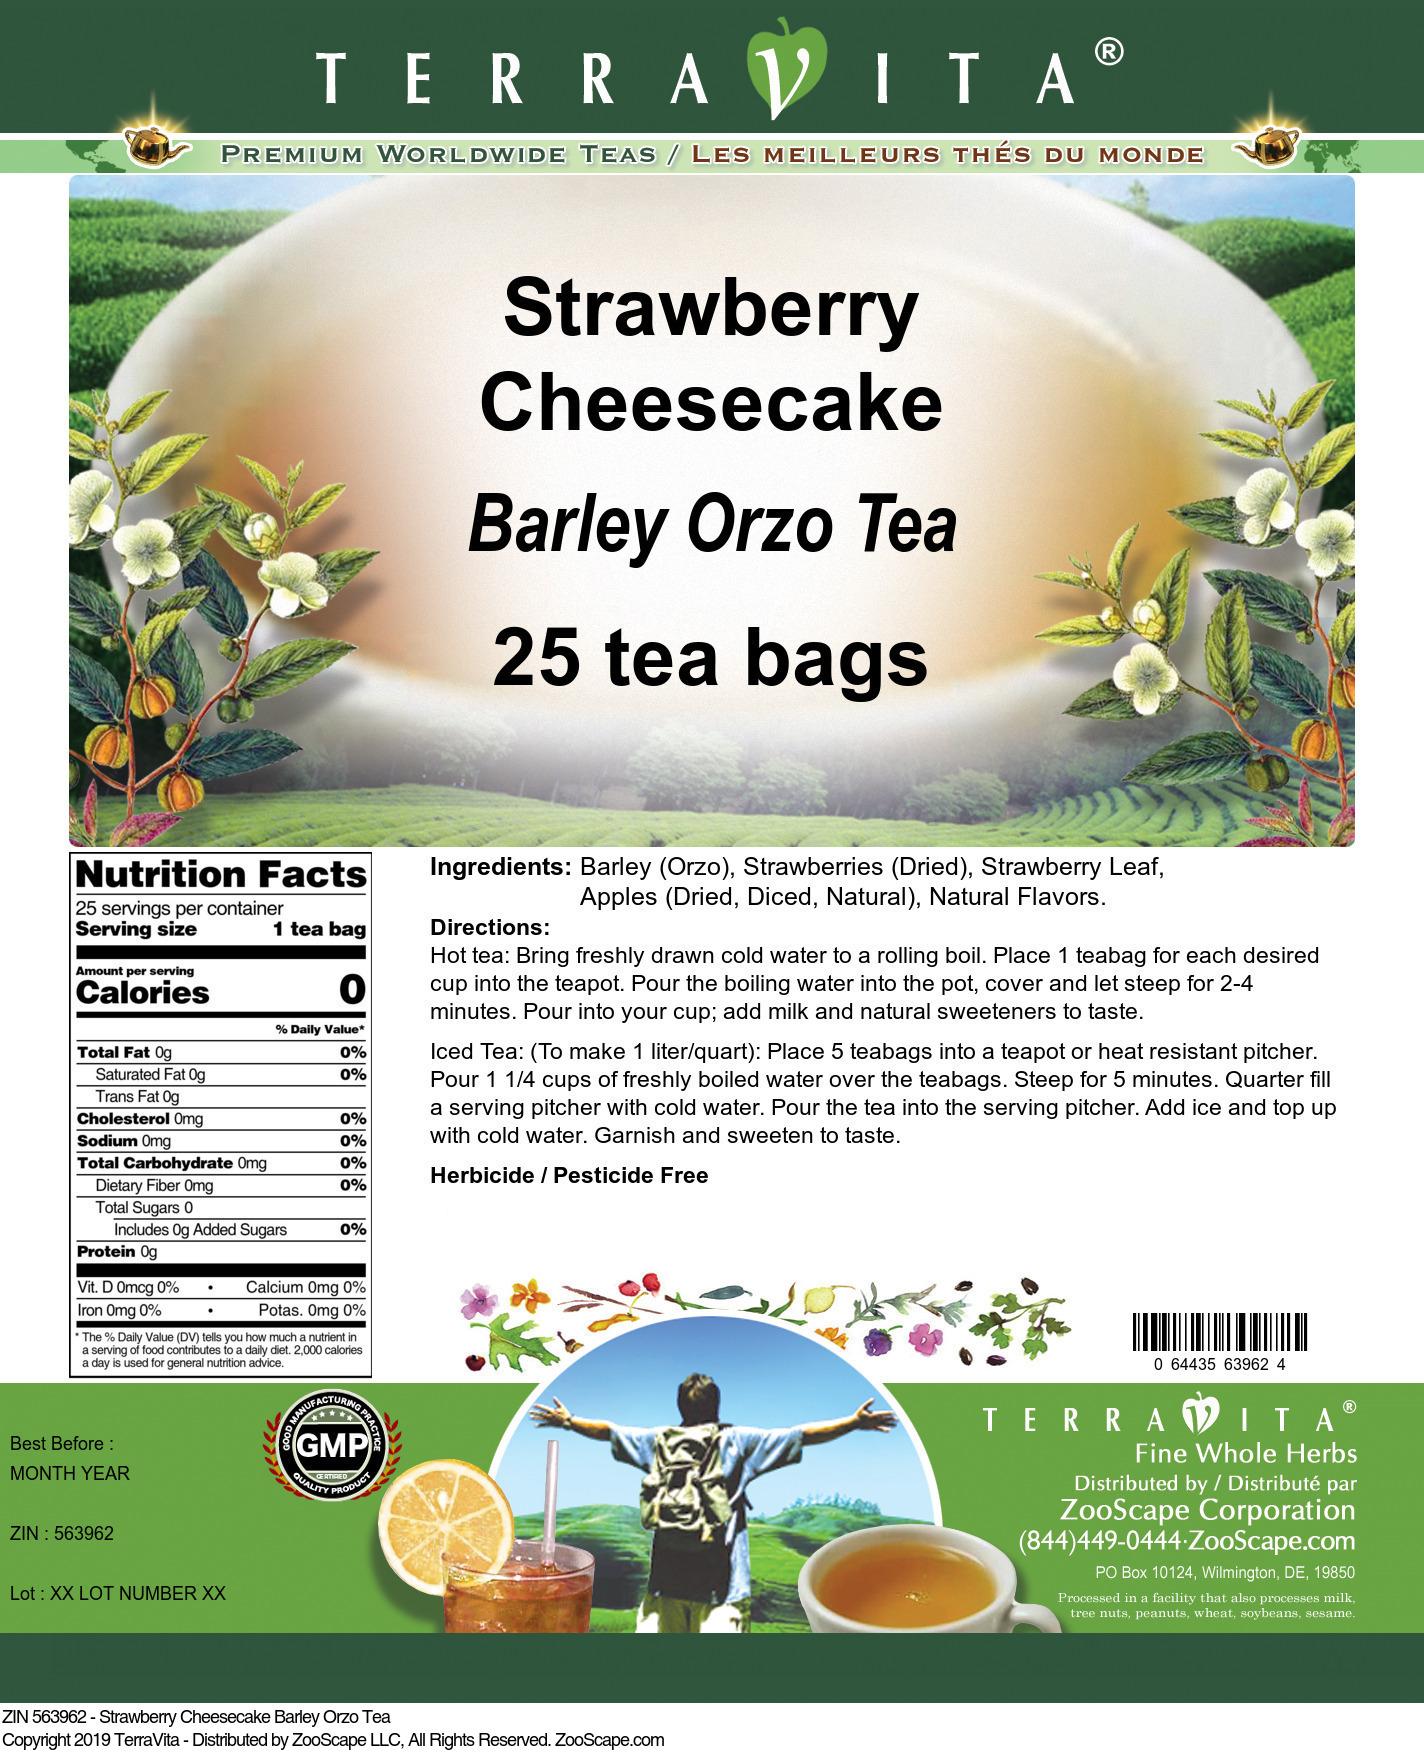 Strawberry Cheesecake Barley Orzo